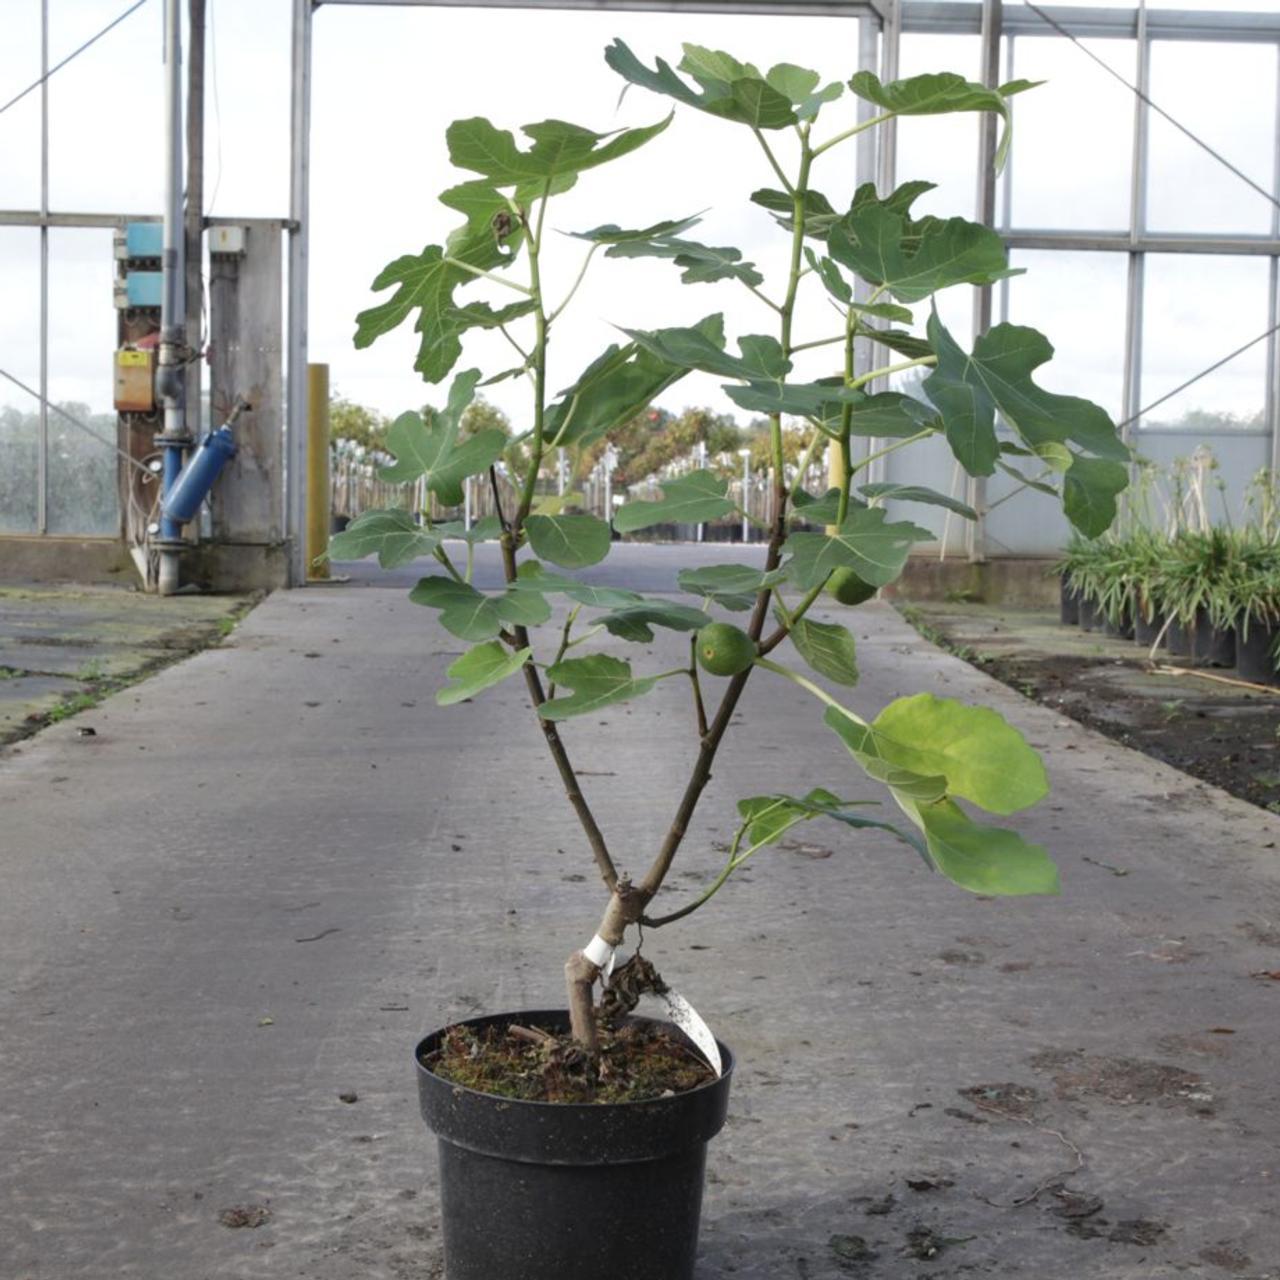 Ficus carica 'Jordan' plant